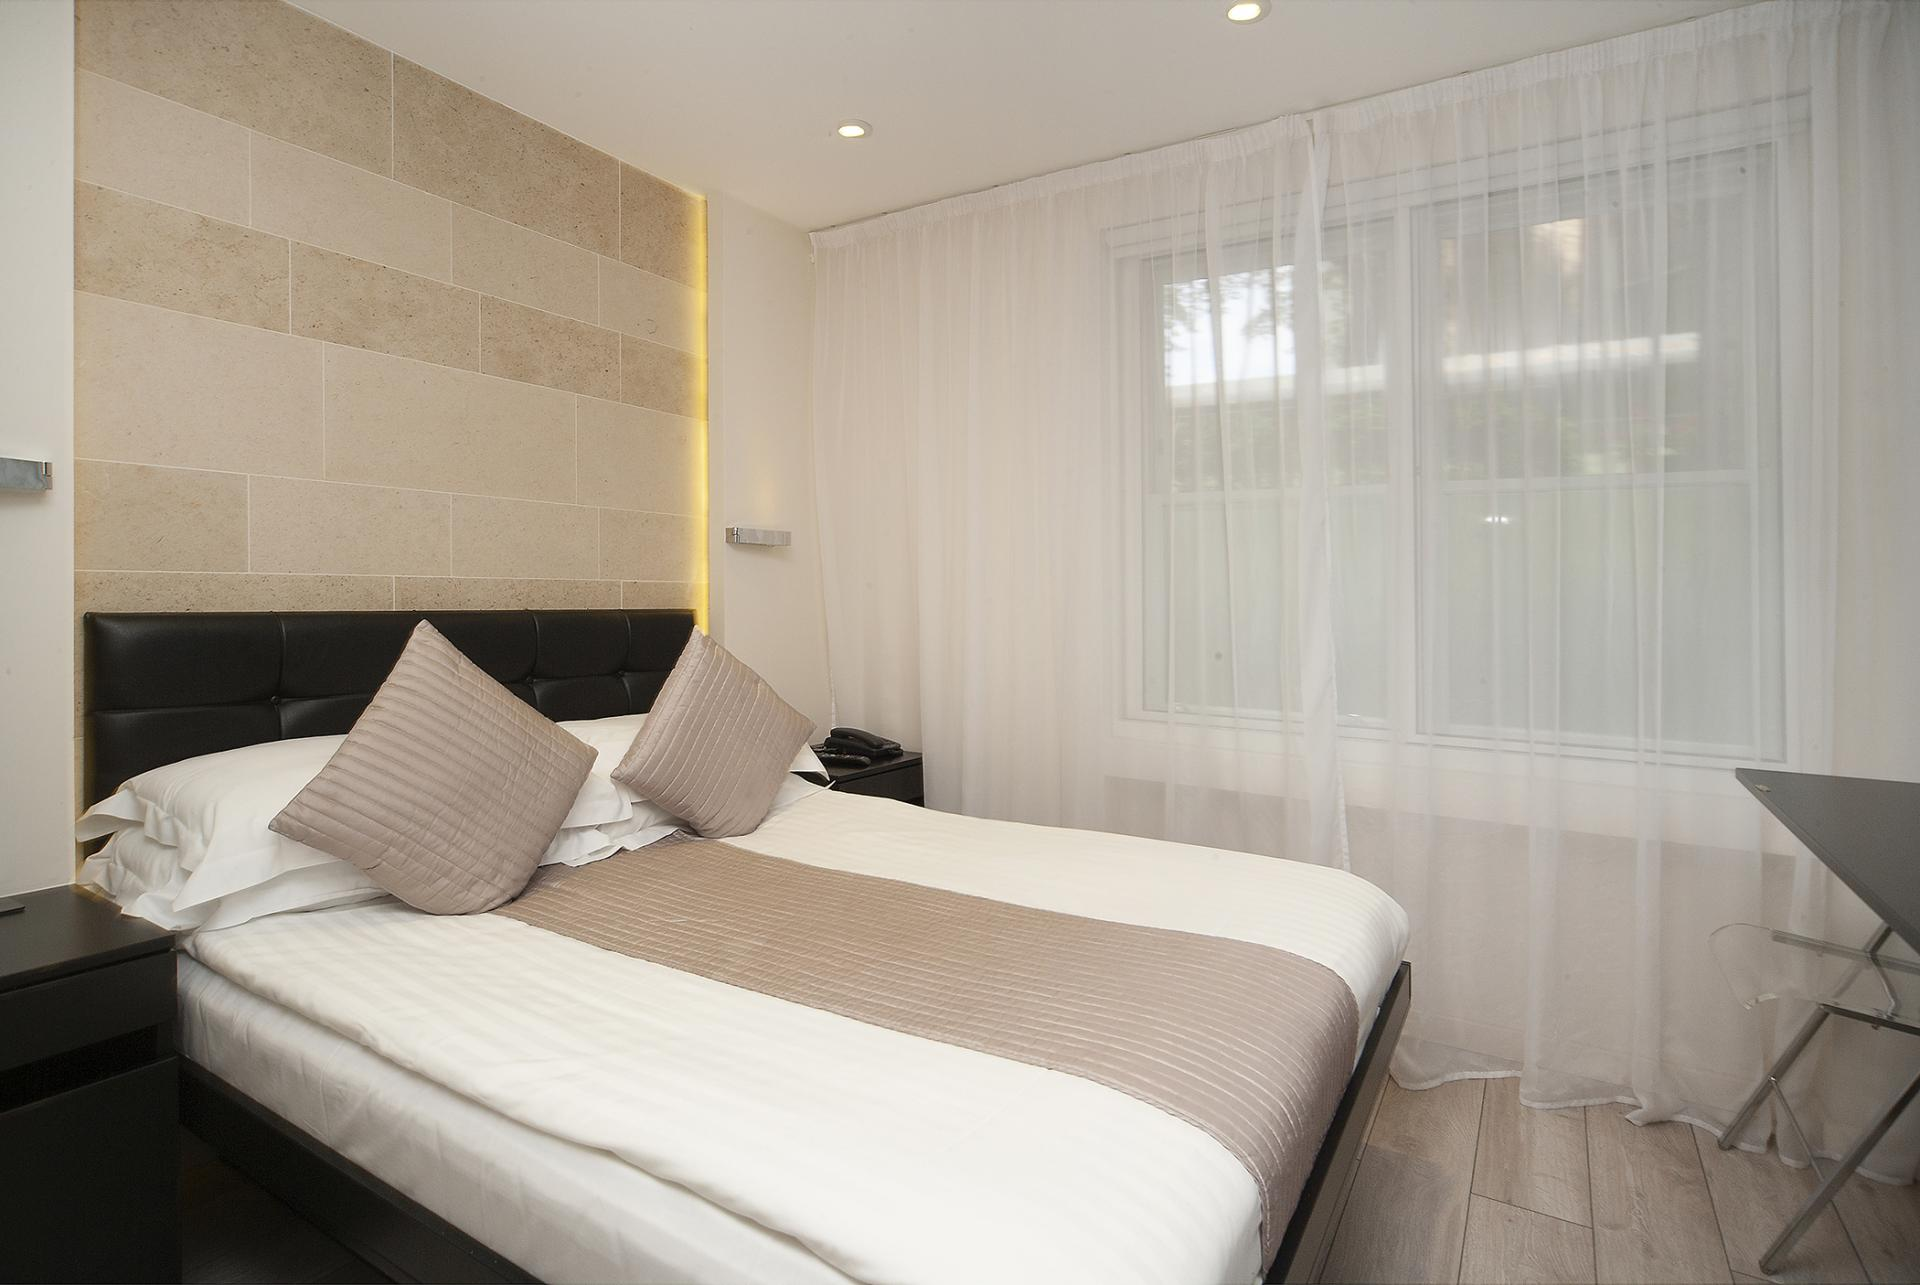 Comfortable bedroom at 88 Studios Kensington - Citybase Apartments